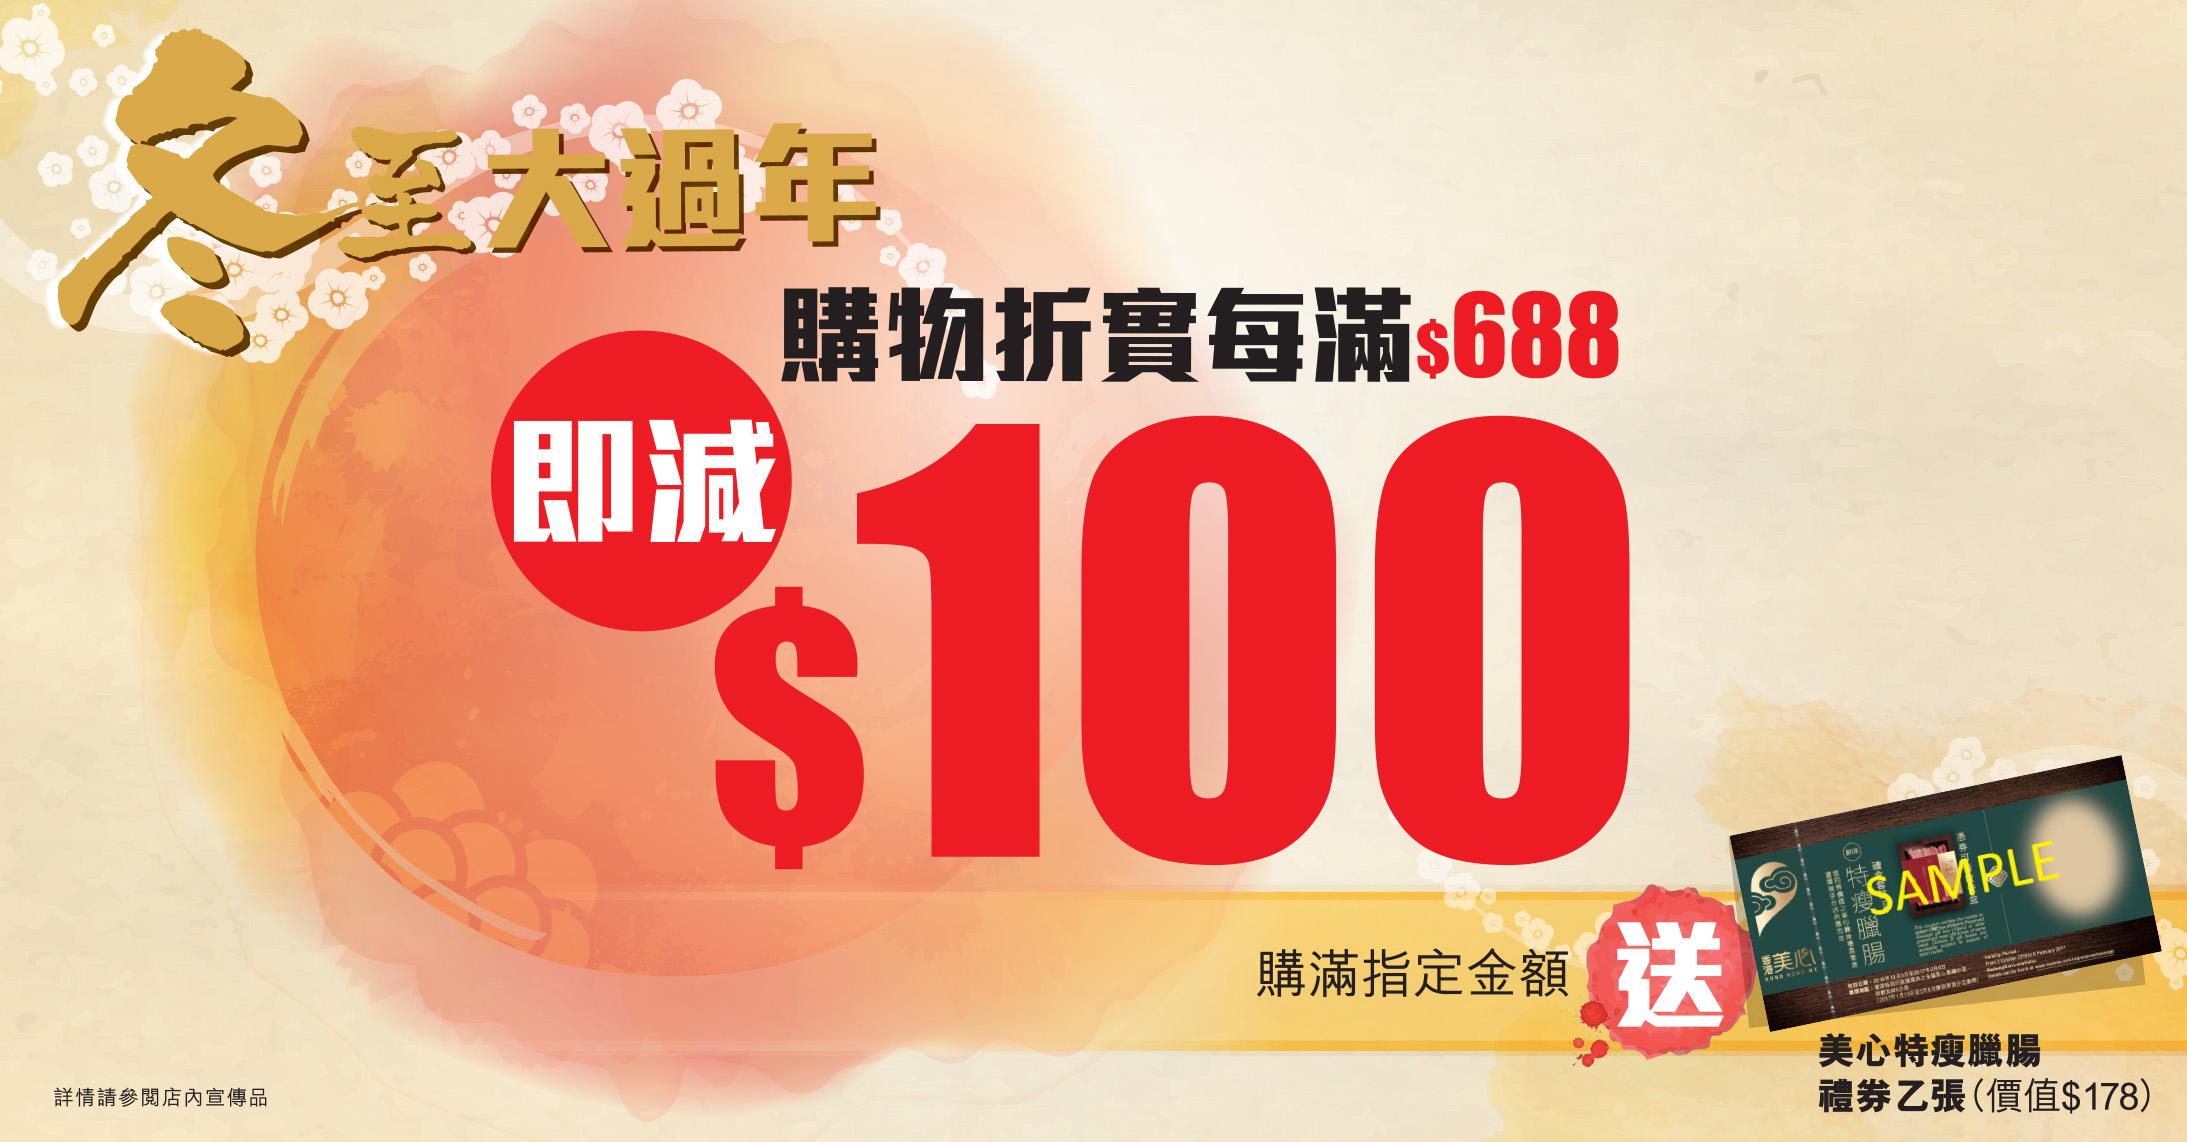 <!--:en-->Winter solstice Promo<!--:--><!--:cn-->冬至大过年<!--:--><!--:hk-->冬至大過年<!--:-->